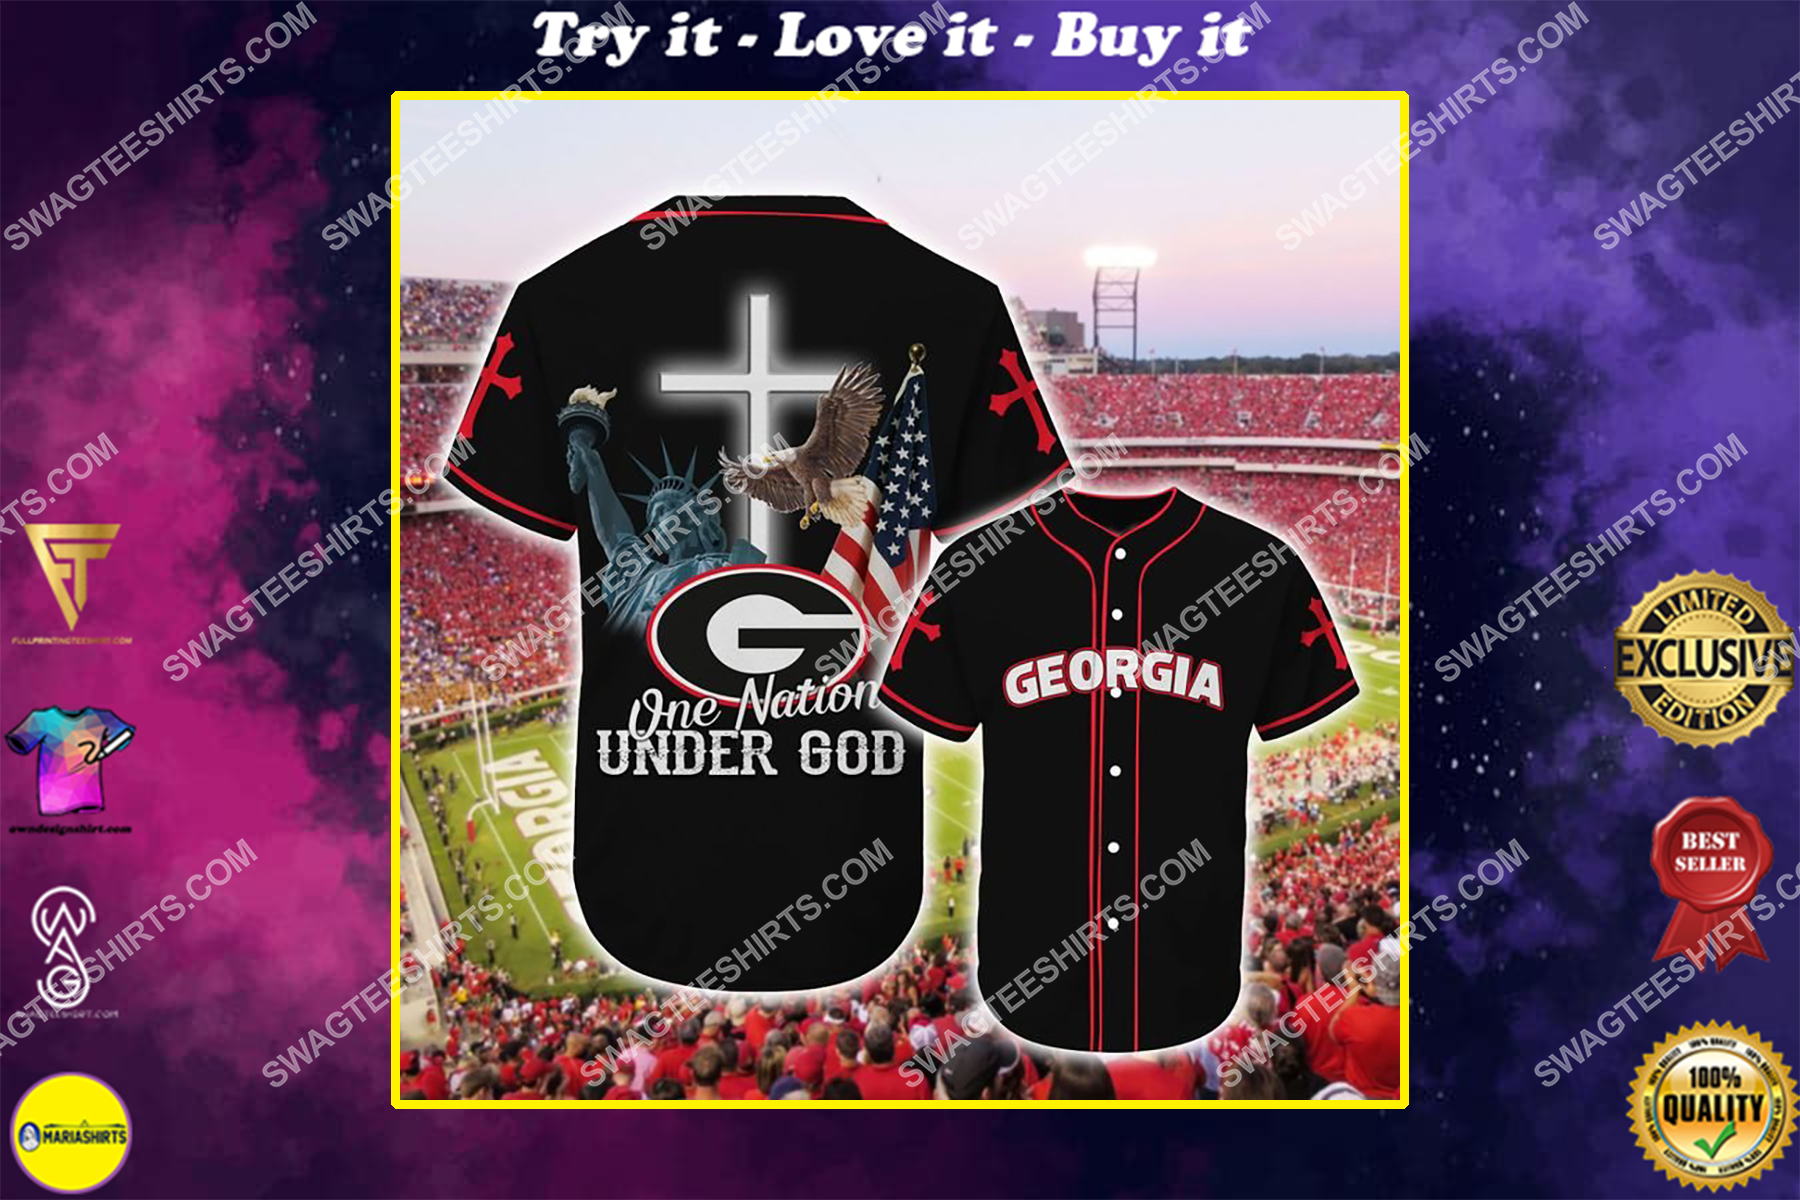 the georgia bulldogs one nation under God full printing baseball jersey